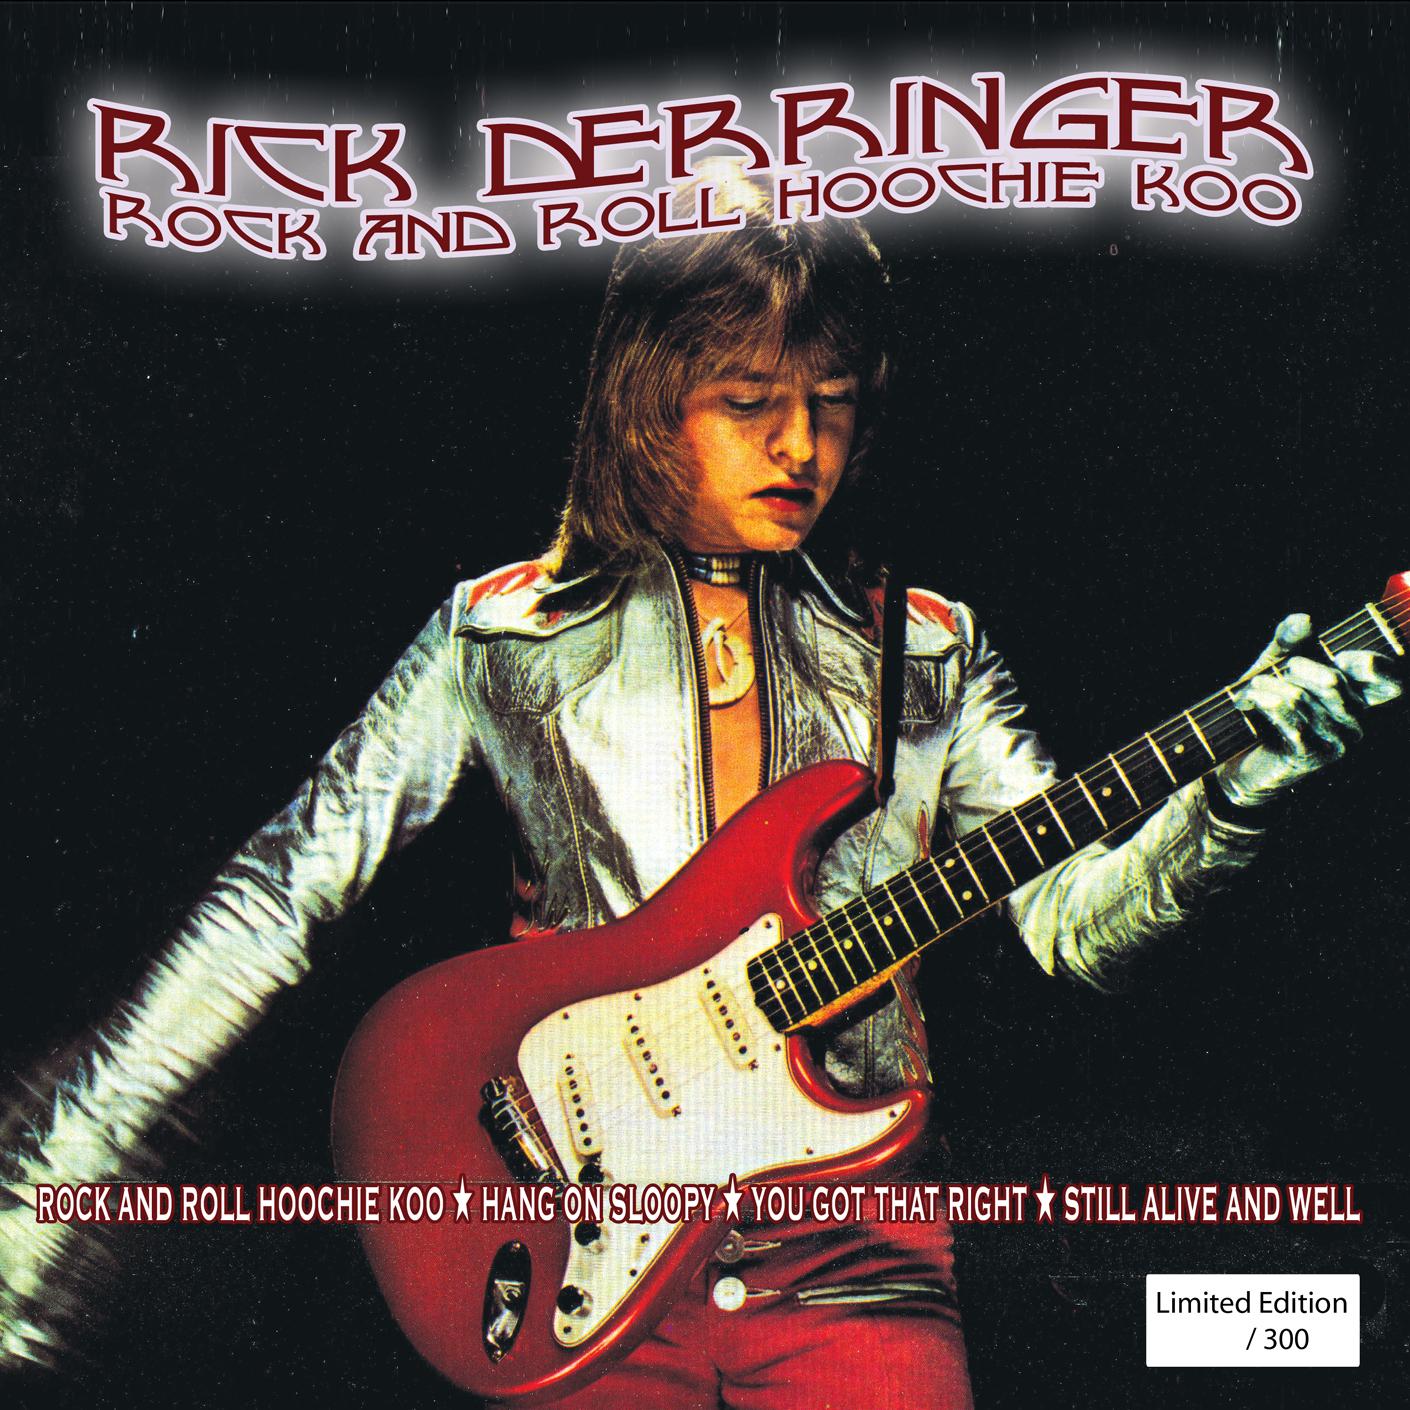 Rock and Roll, Hoochie Koo – Rick Derringer